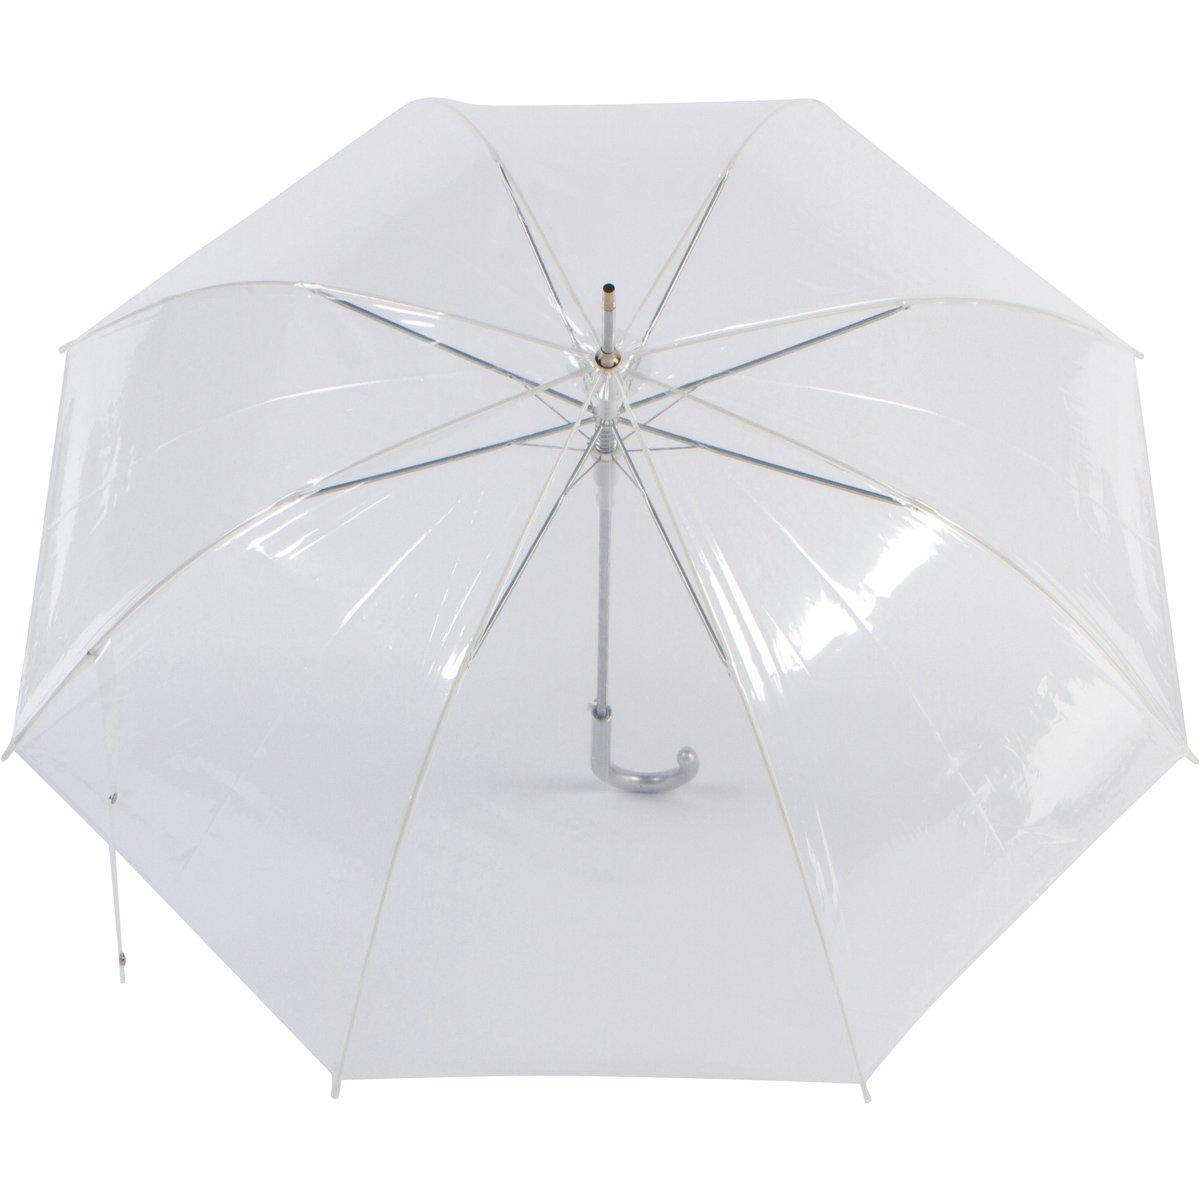 Cloak Umbrellas Auto Open Clear Umbrellas, 46'' ARC by Cloak Umbrellas (Image #3)